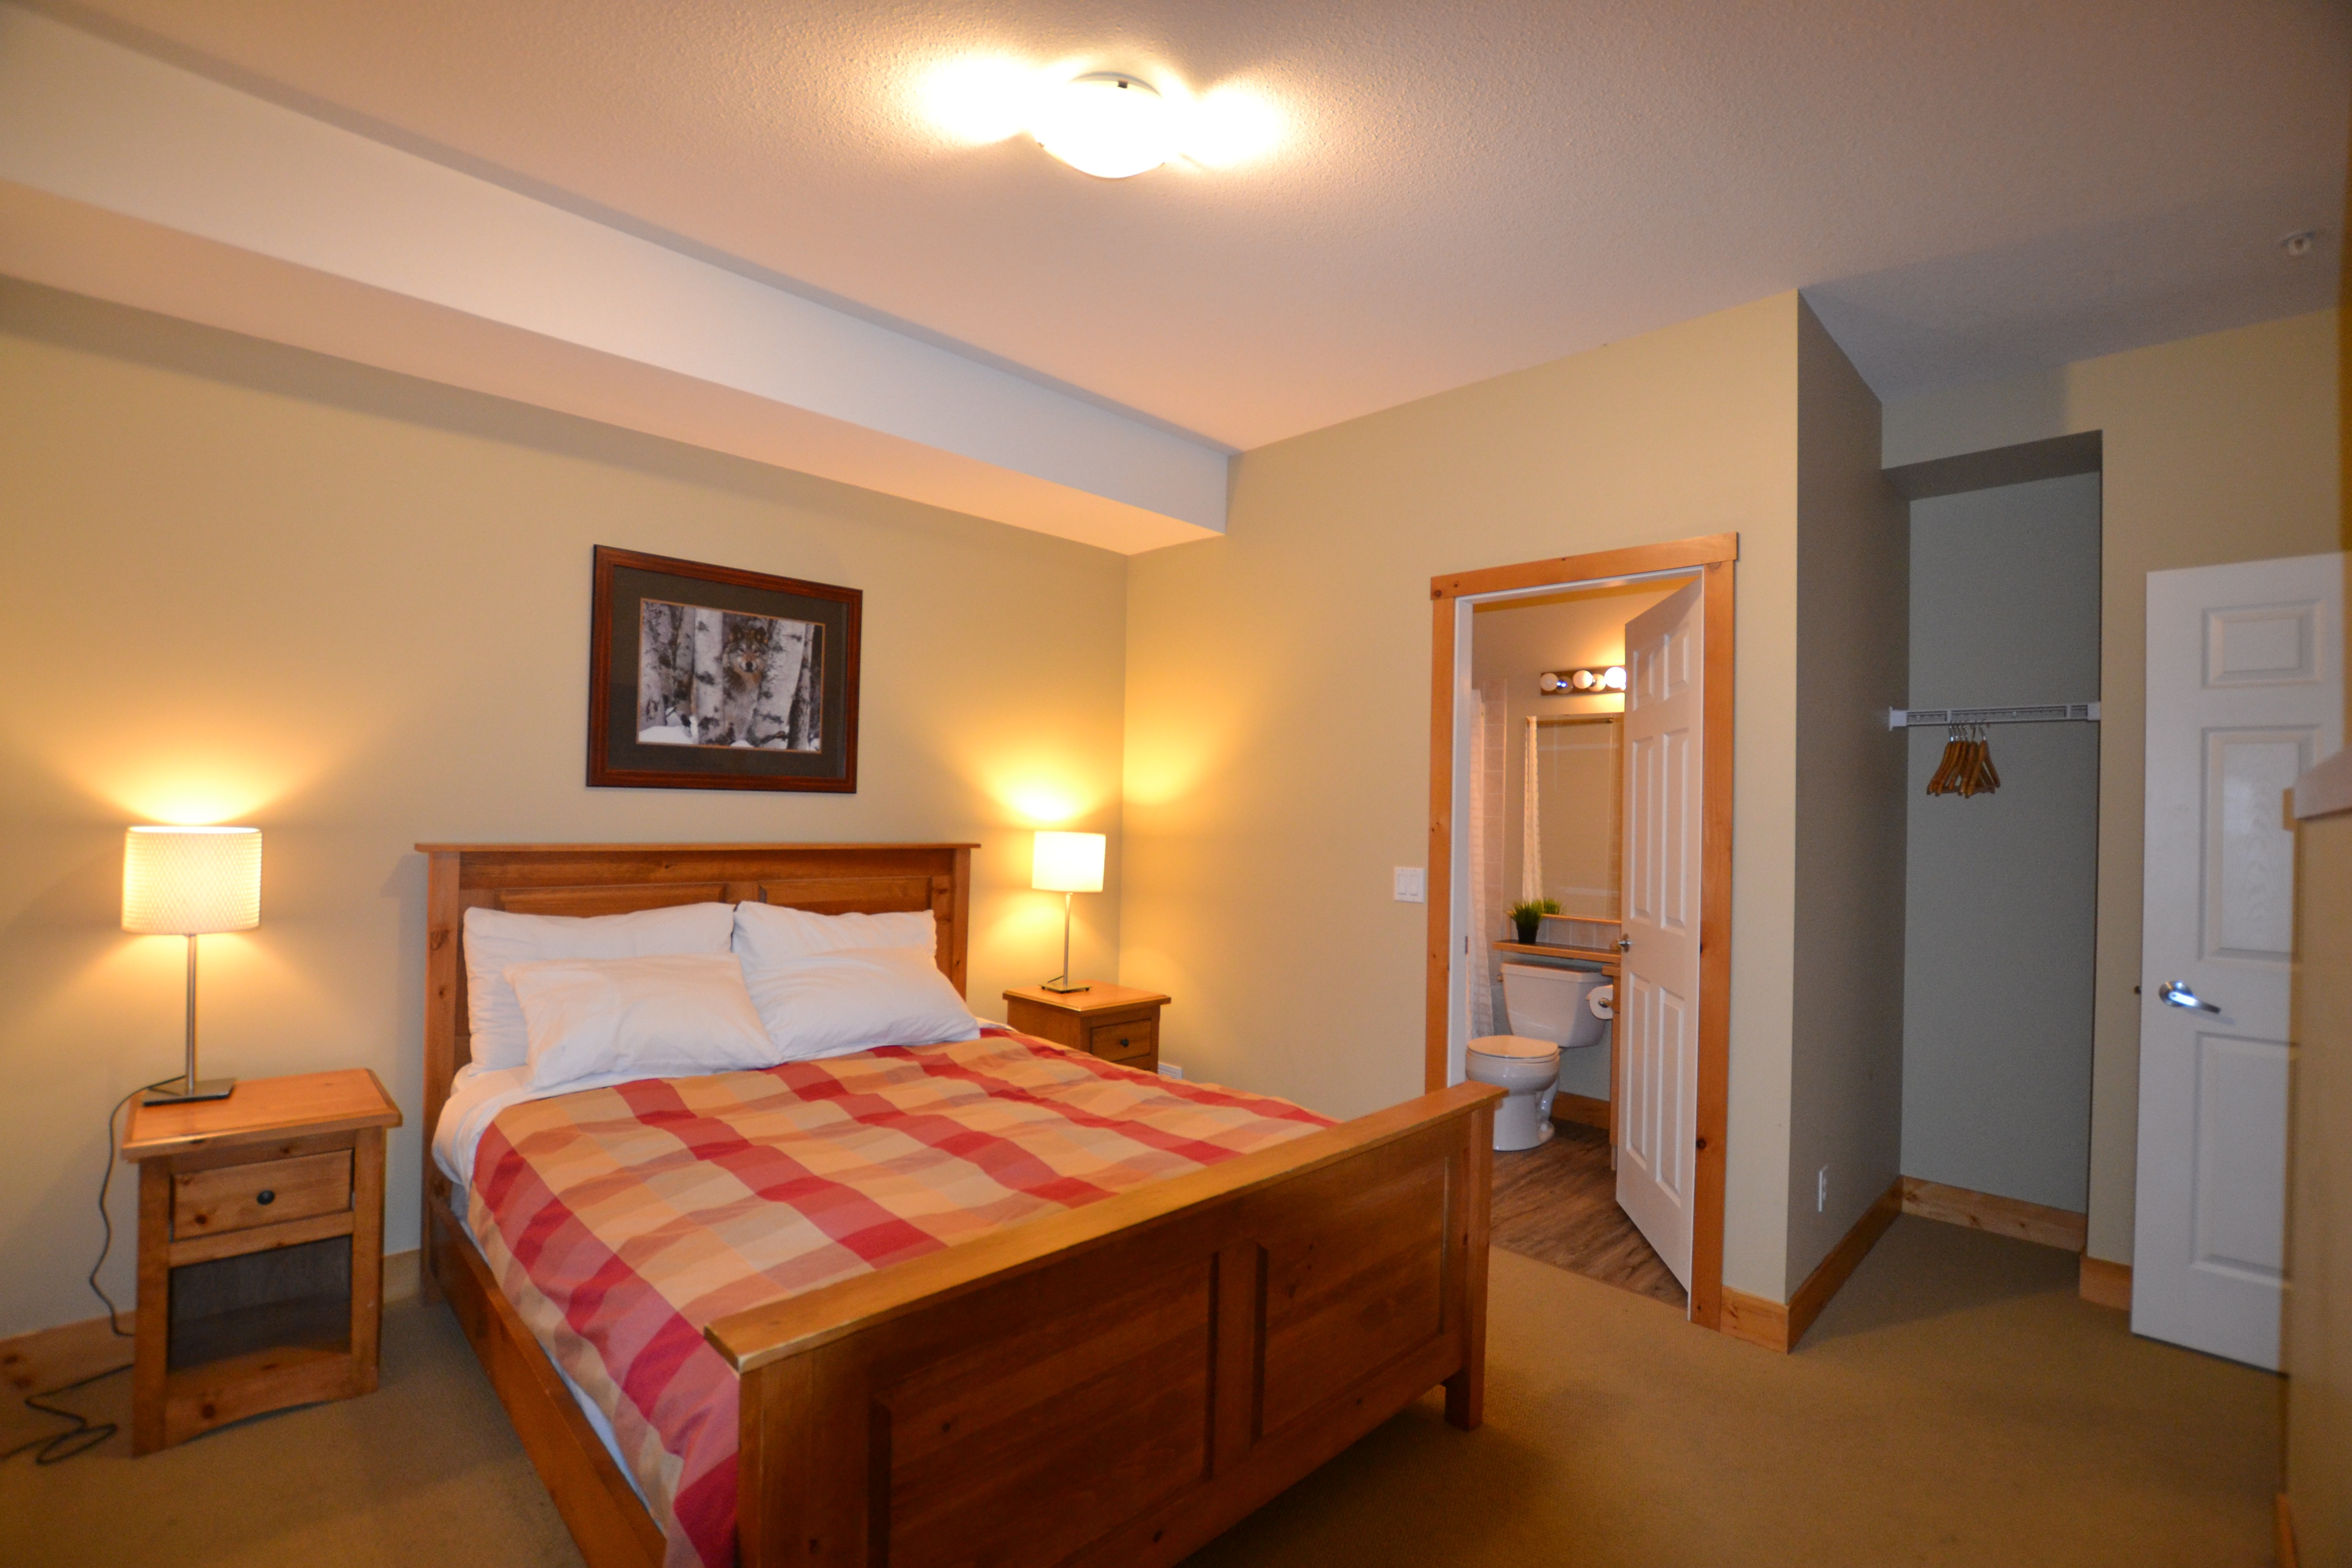 410 Bdrm 1( Main Floor)